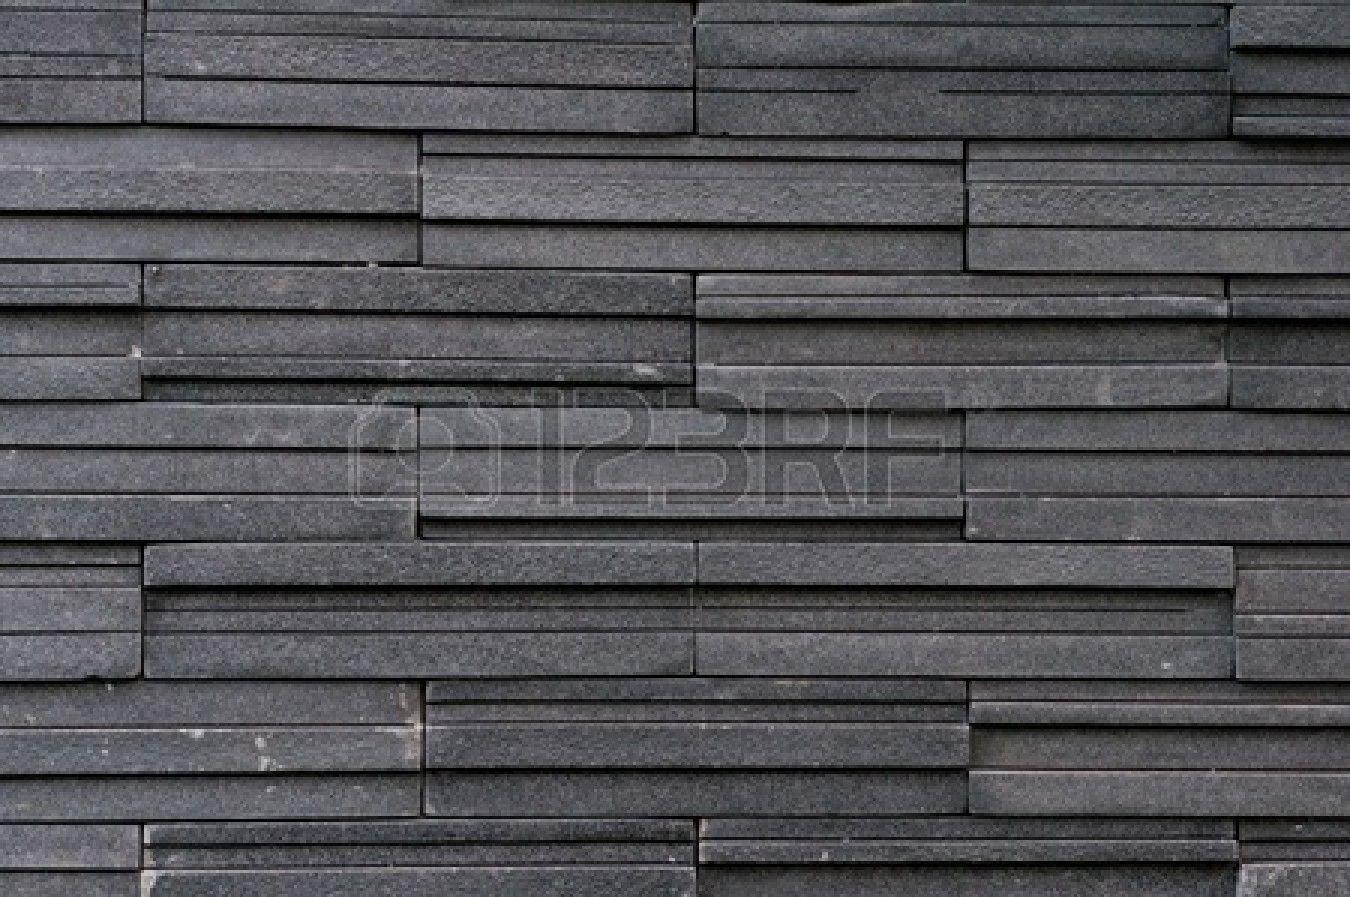 modern kitchen wall tiles texture. textured tile | dark grey texture stone brick wall surfaced . modern kitchen tiles x